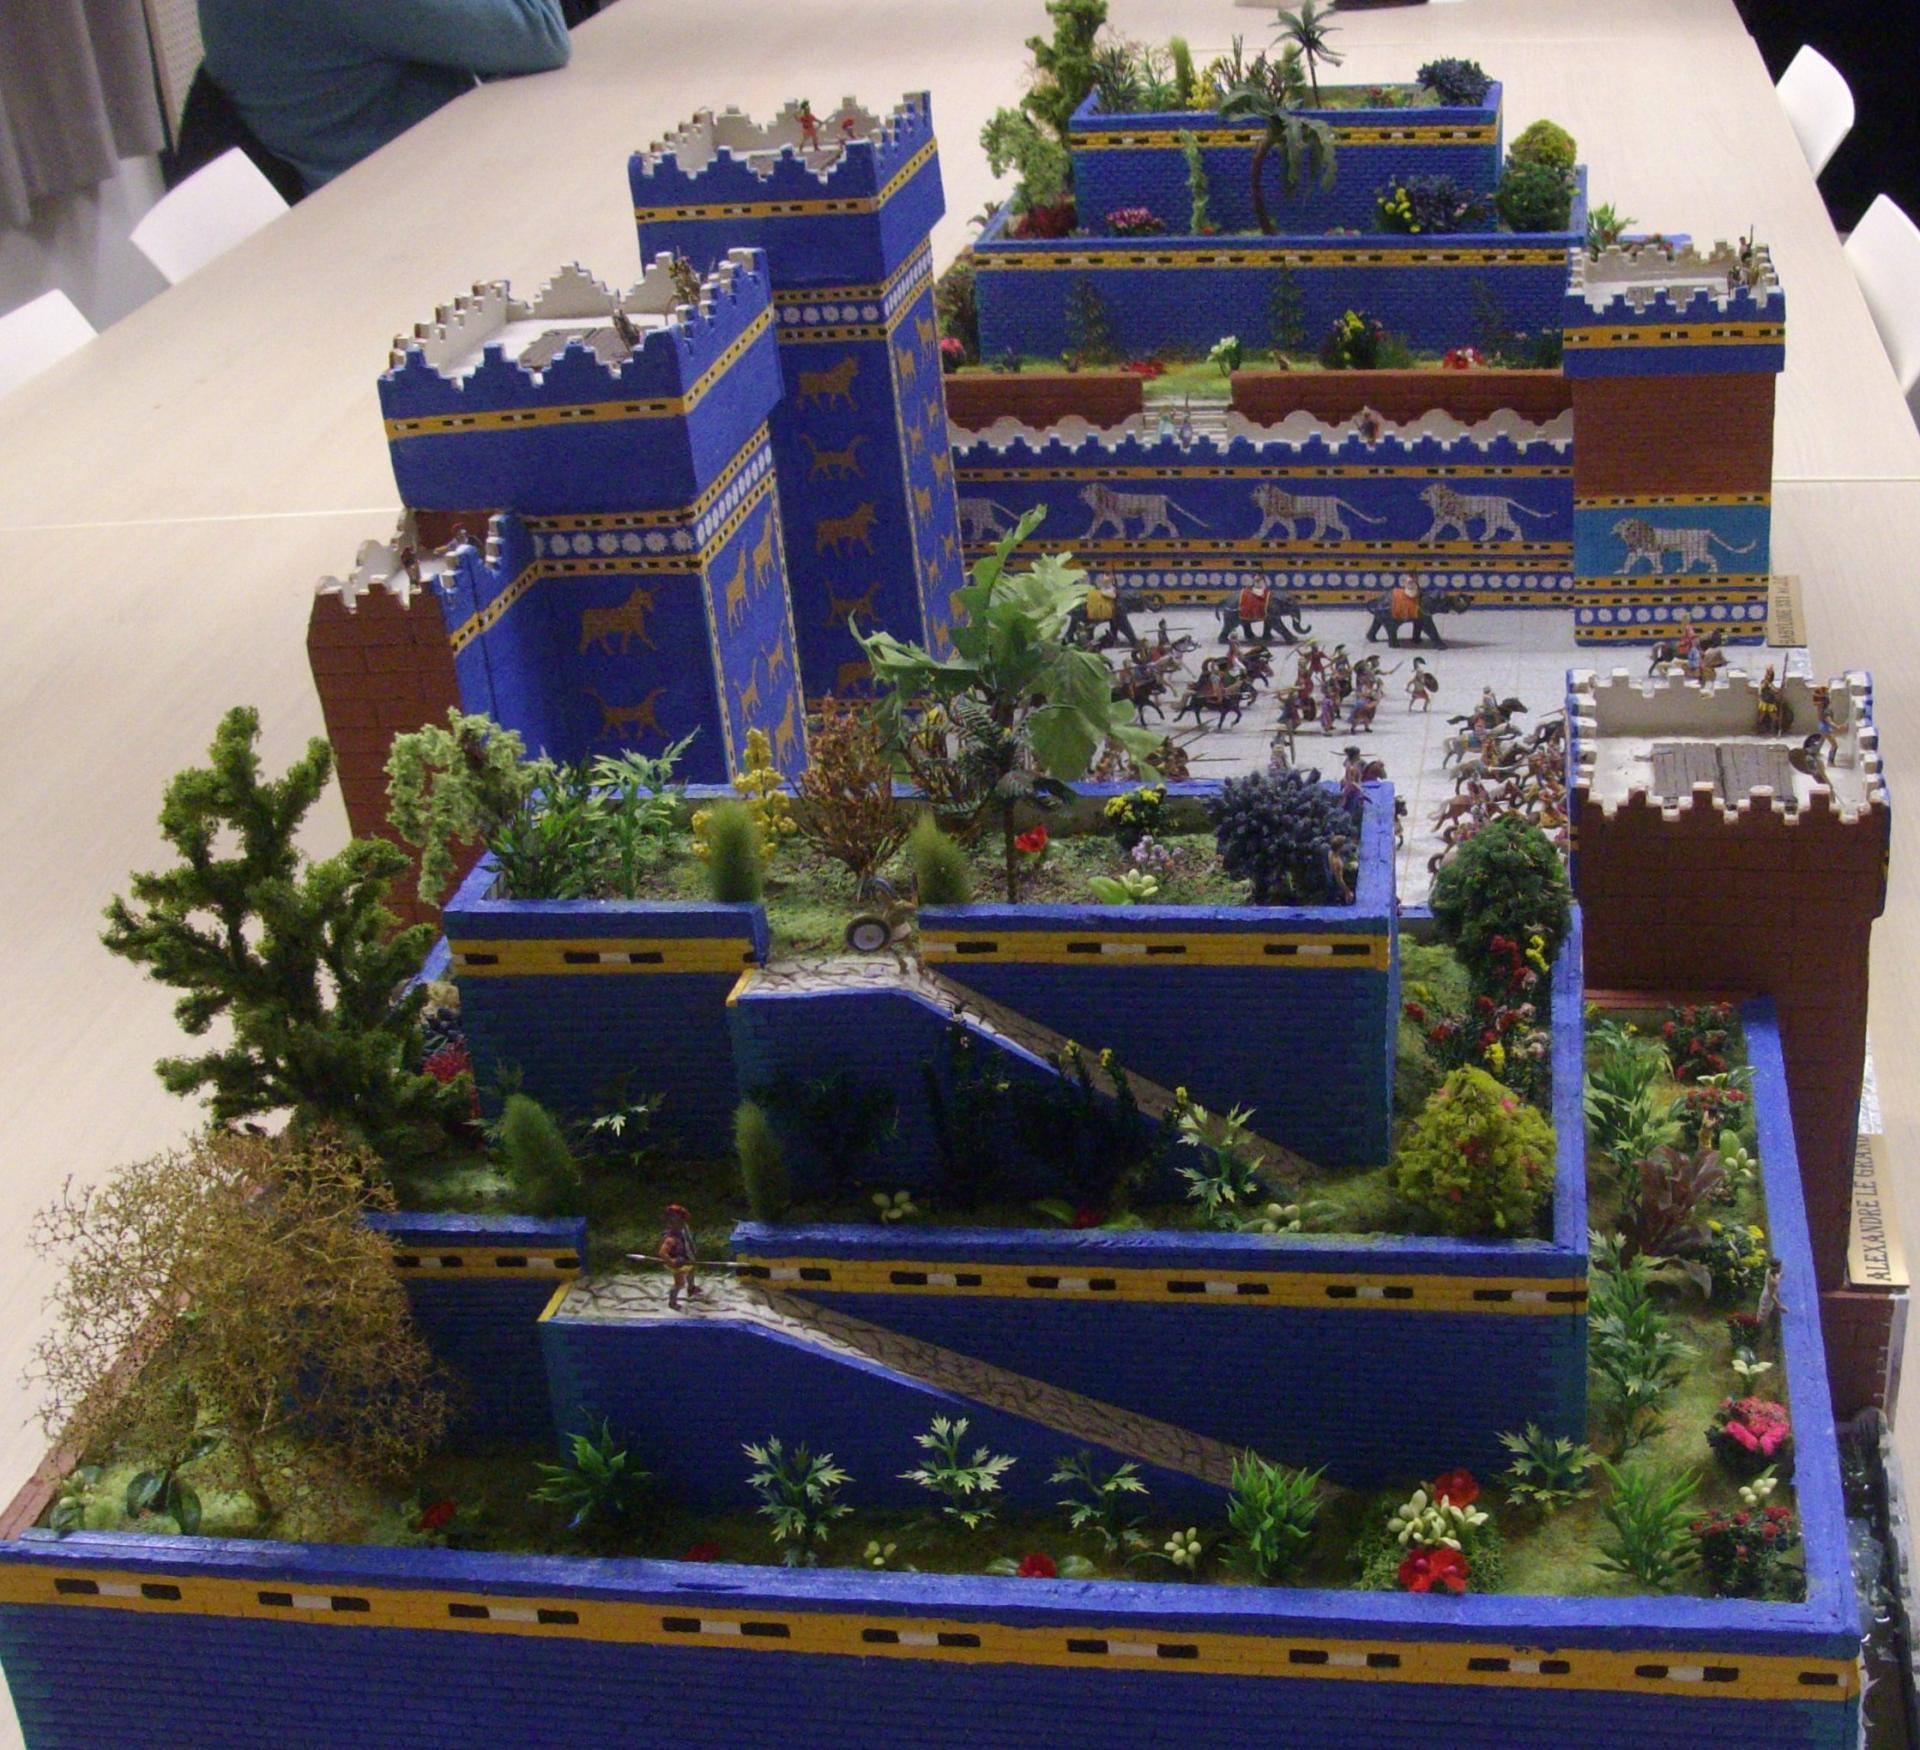 Royal maquette a cr un diorama d 39 alexandre le grand for Jardin suspendu babylone